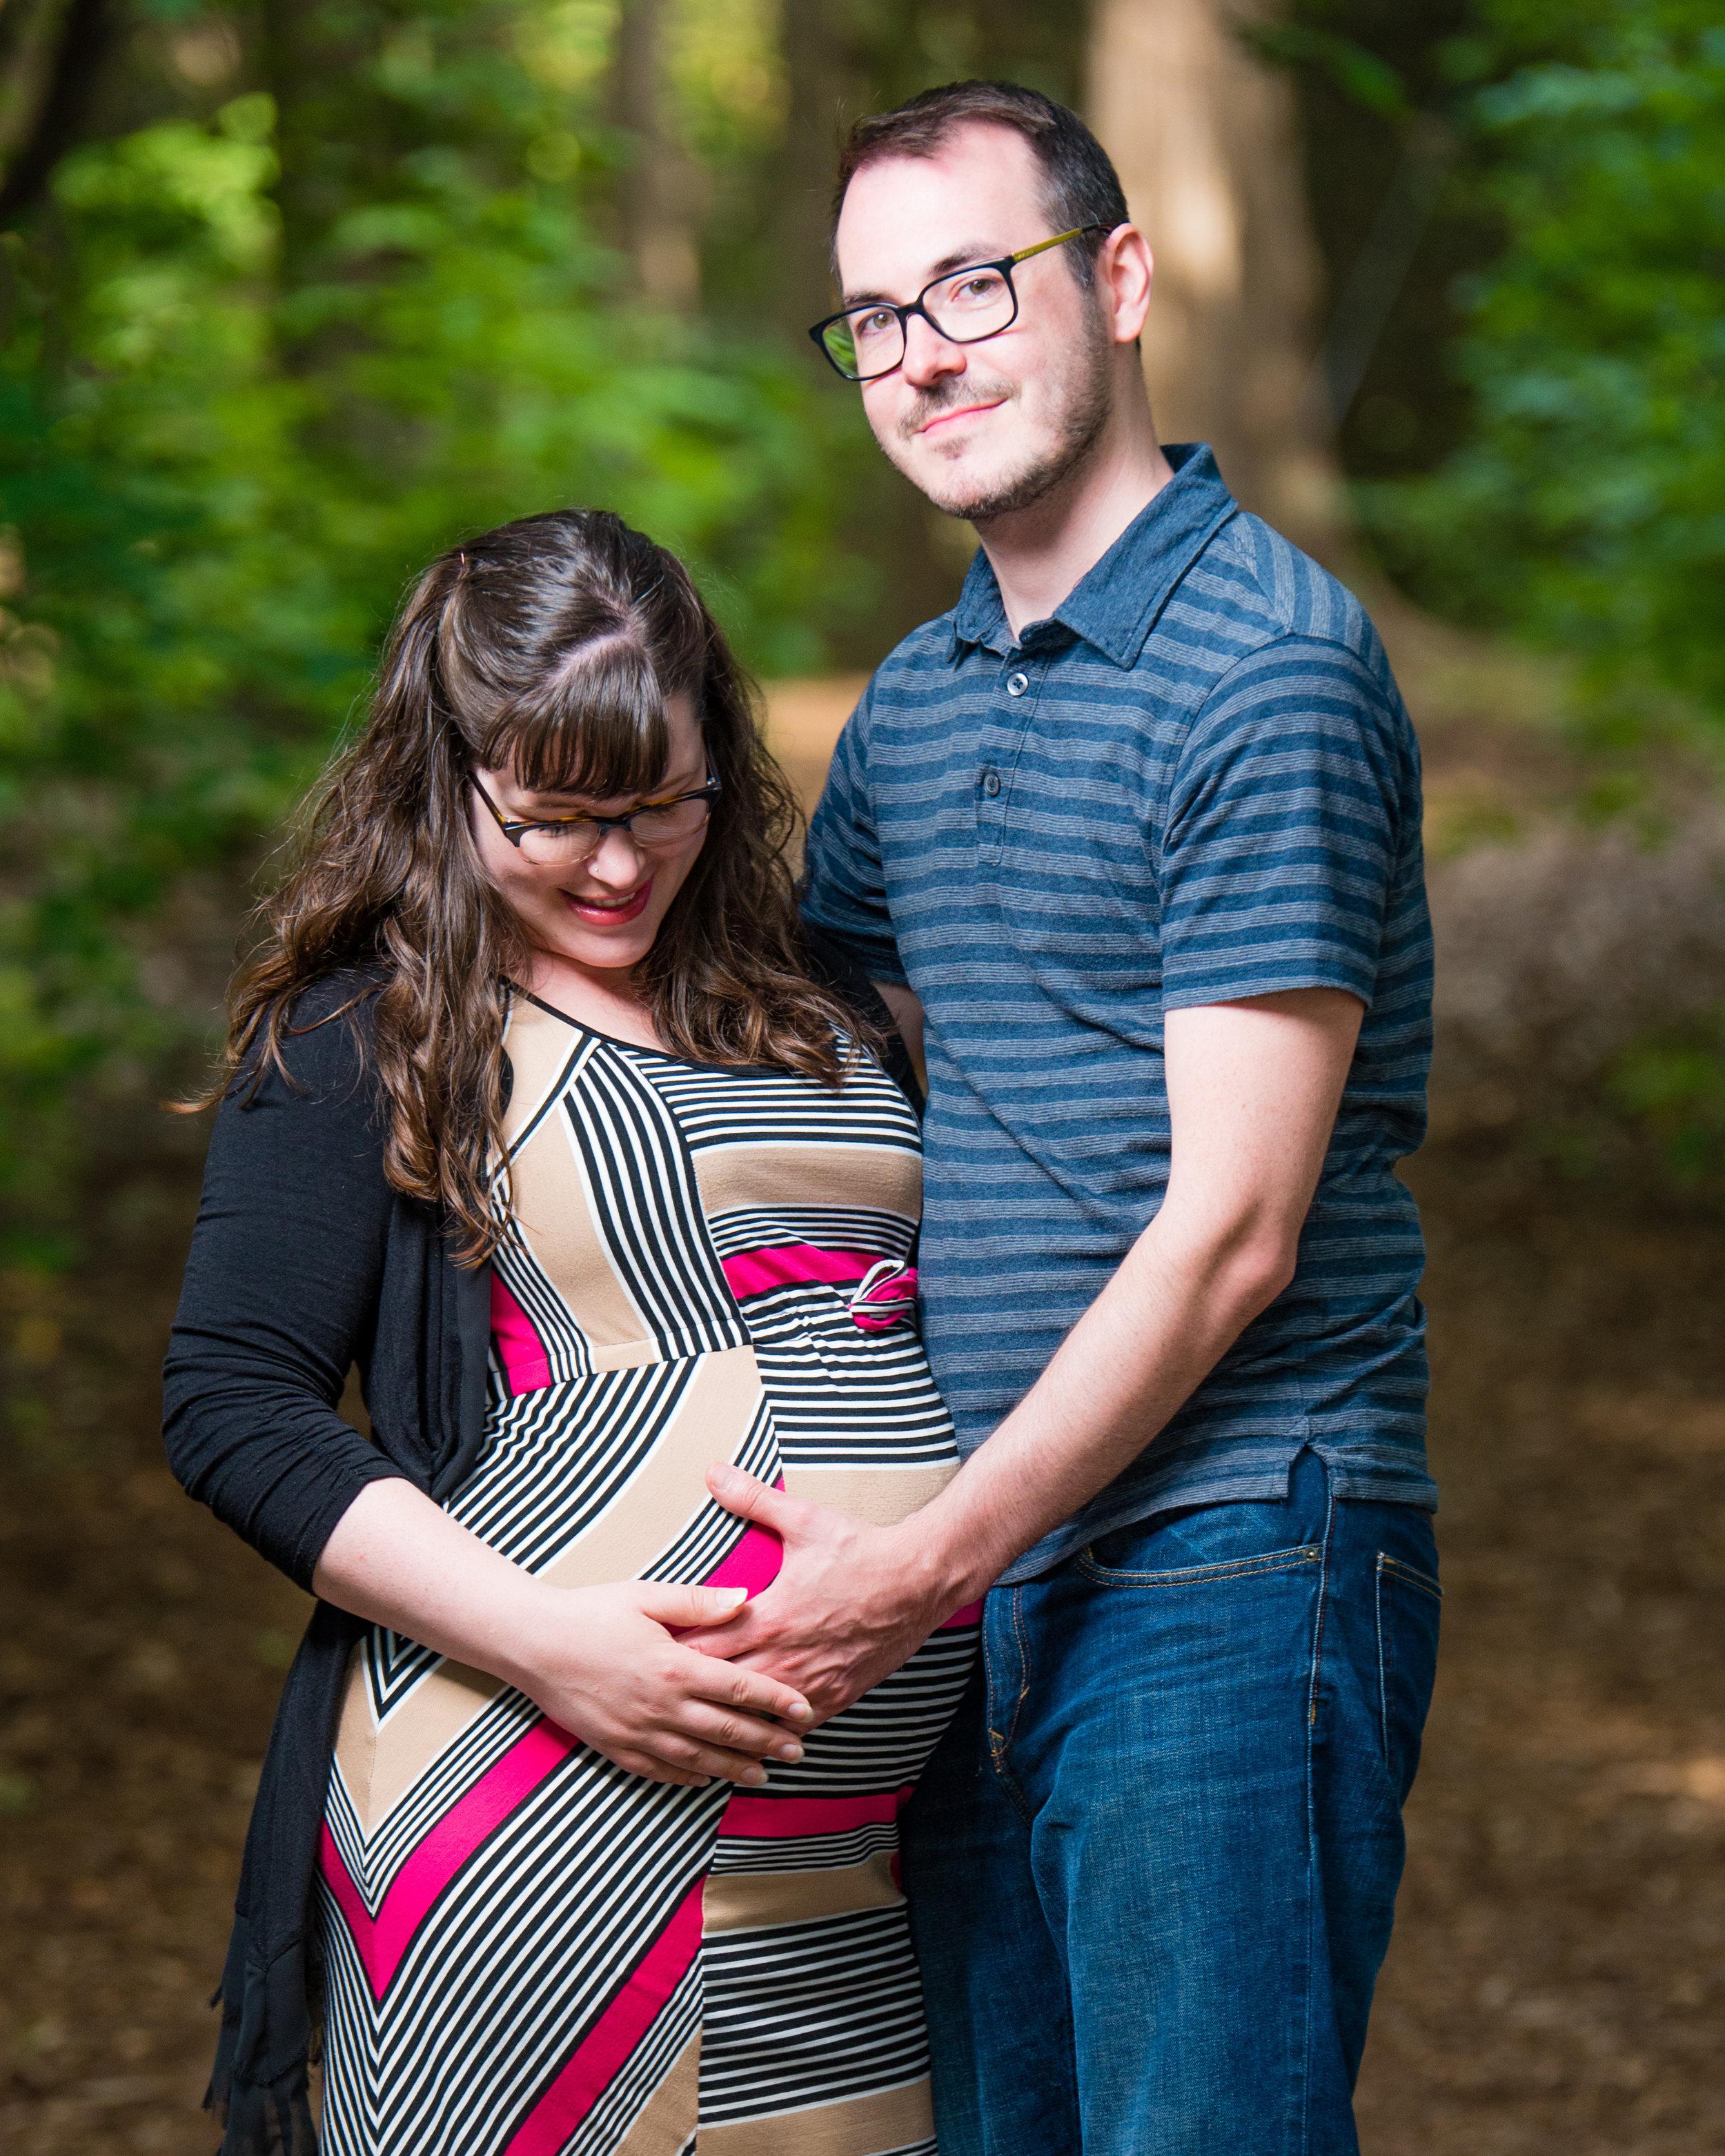 2018_June_23-06_23_2018_Ben_Anna_Maternity-48844-Edit.jpg